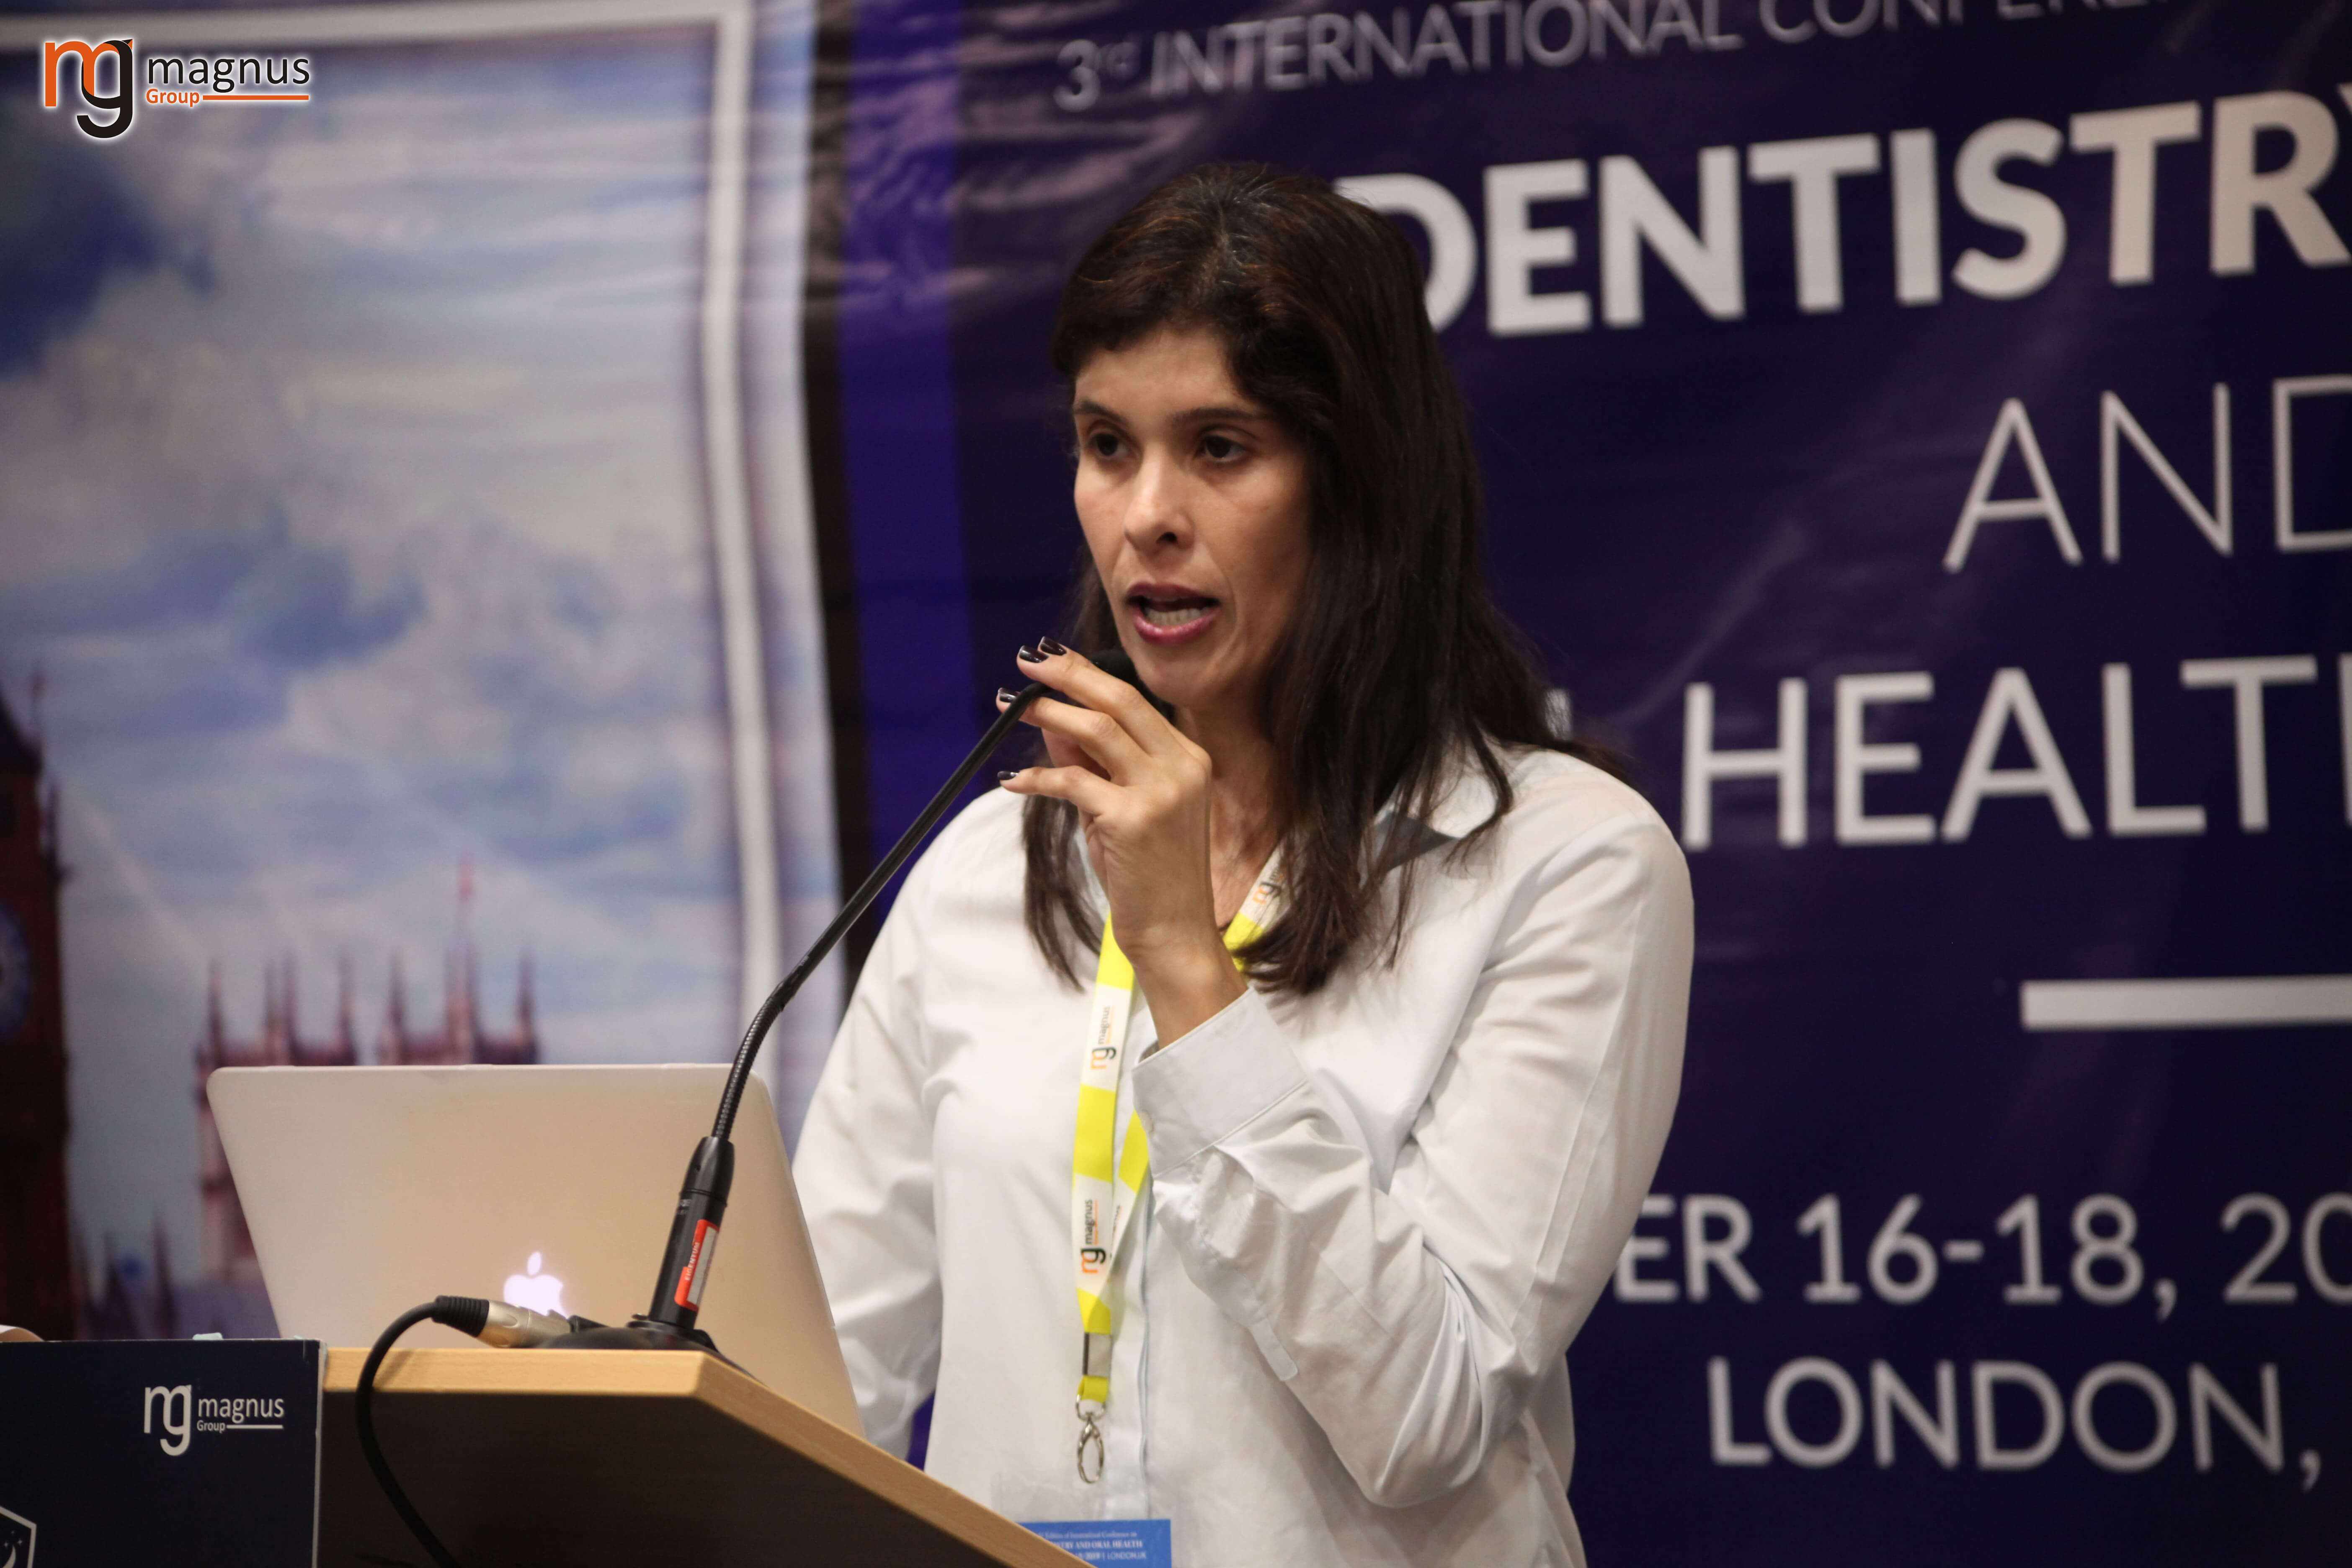 Dentistry Conference- Erika Storck Cezario